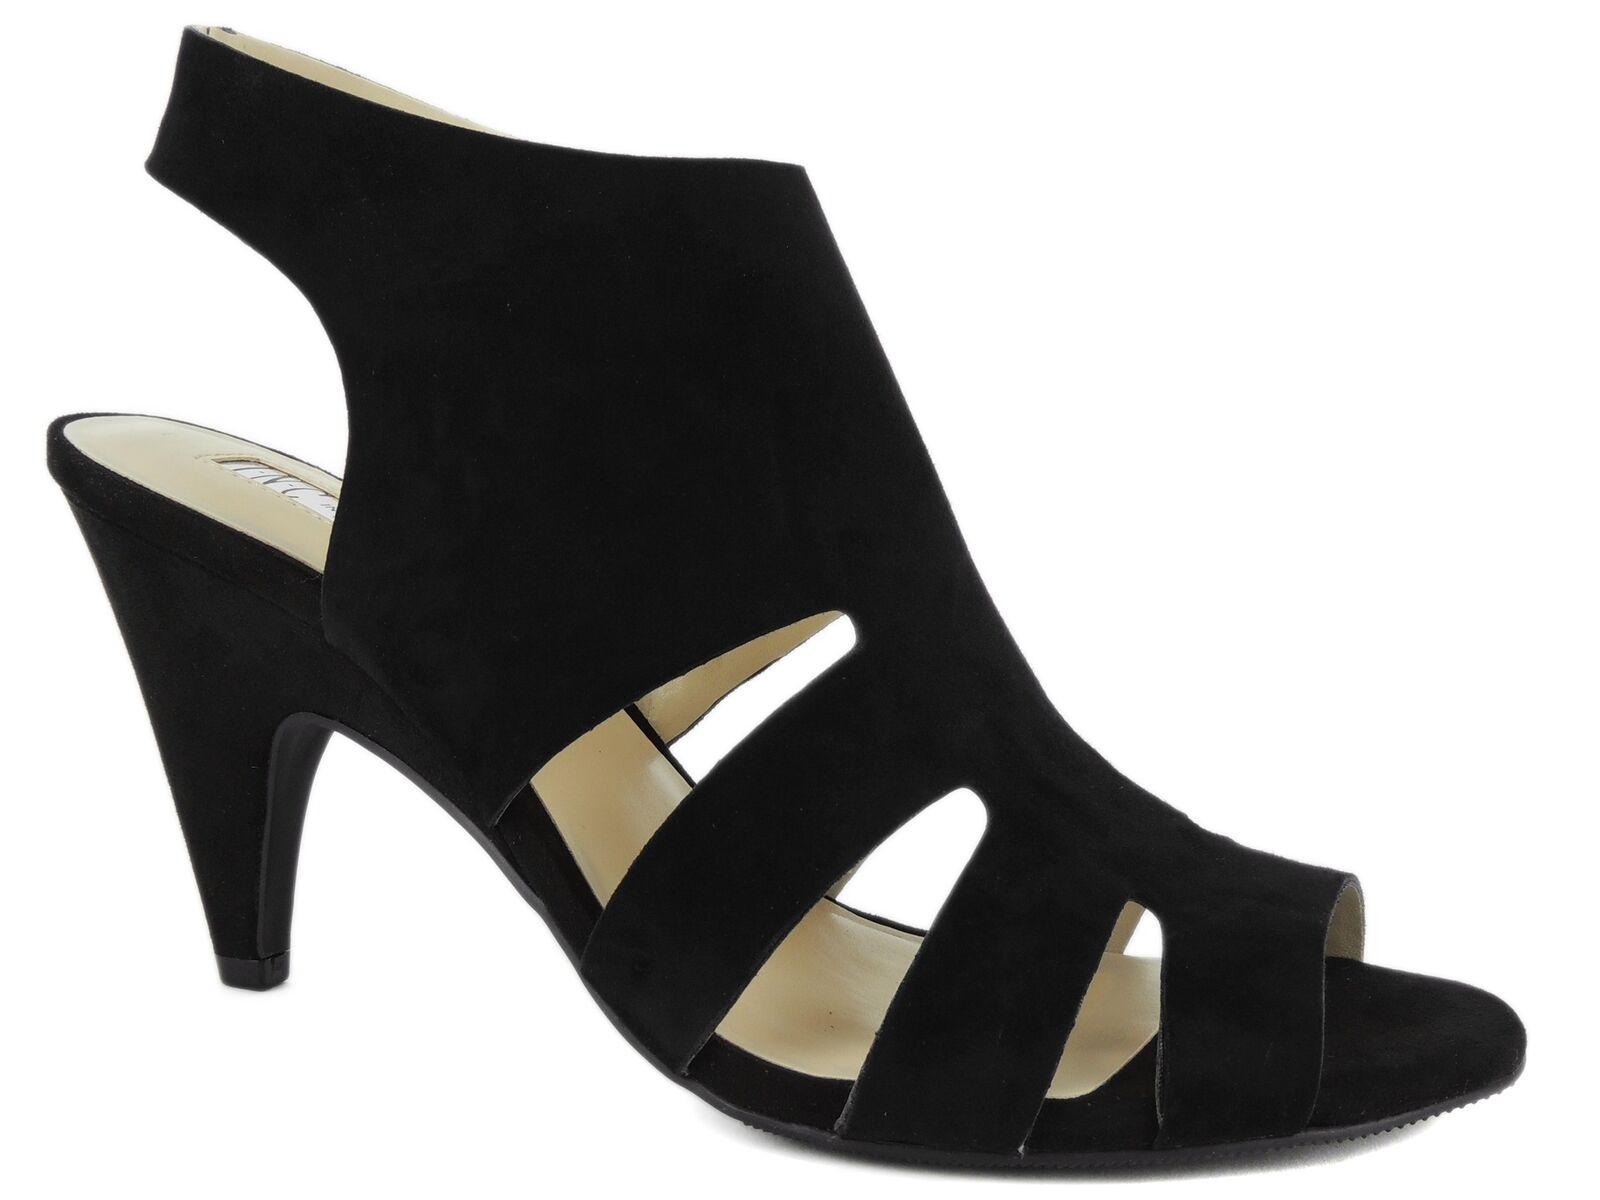 INC International International International Concepts Women's Giannah Sandals Black Suede Size 7.5 M baa6e8